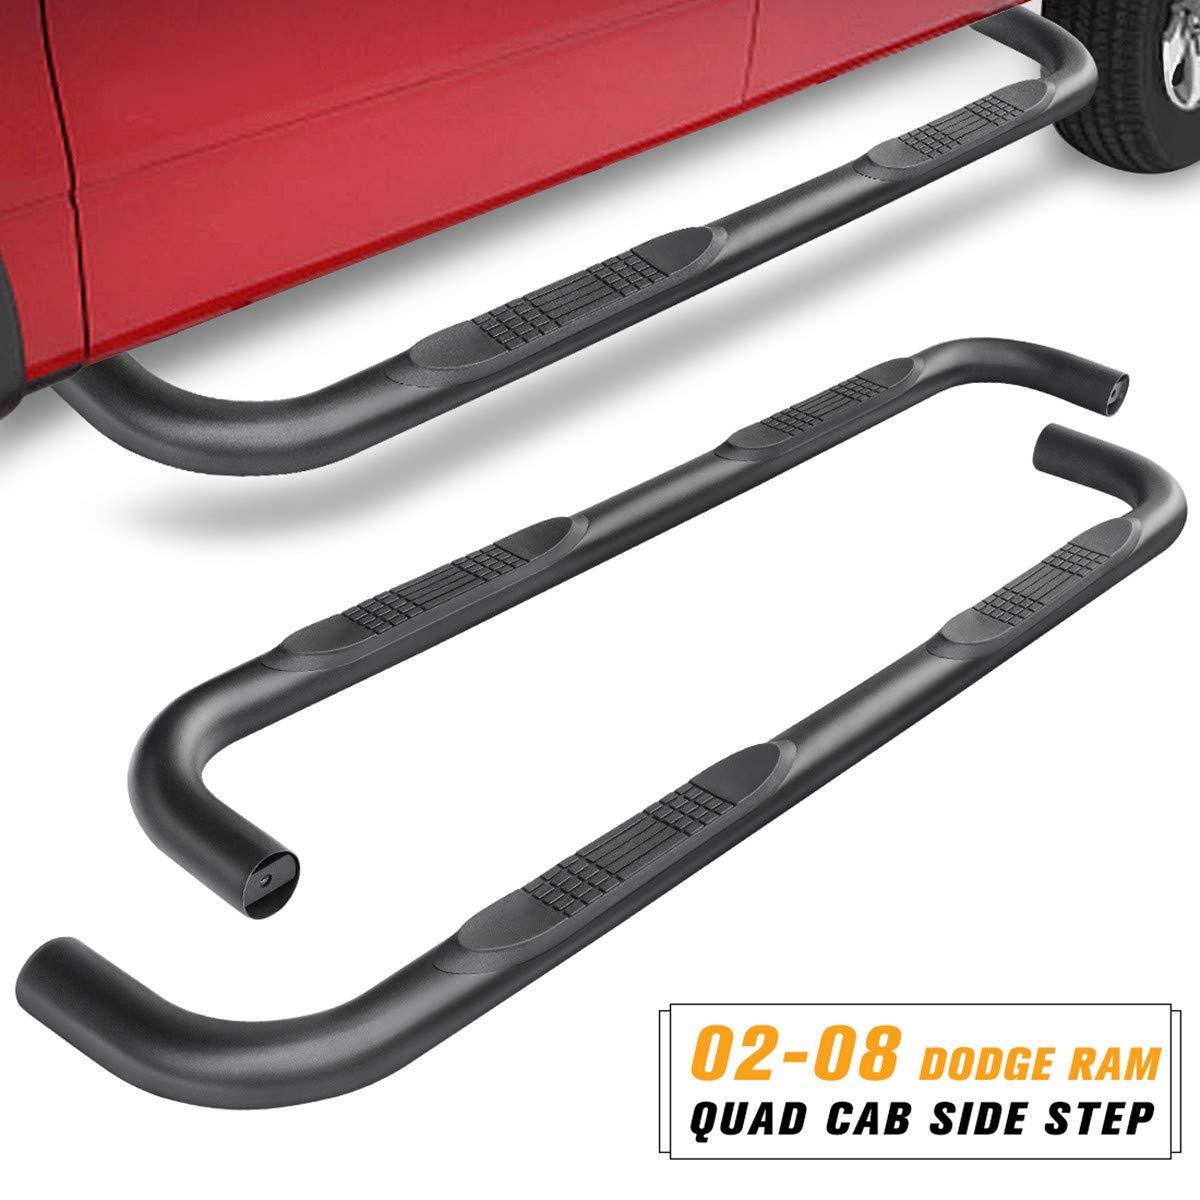 Cab Side Step Nerf Bars Crew Maxiii Running Board For Dodge Ram 1500 2500 3500 Quad